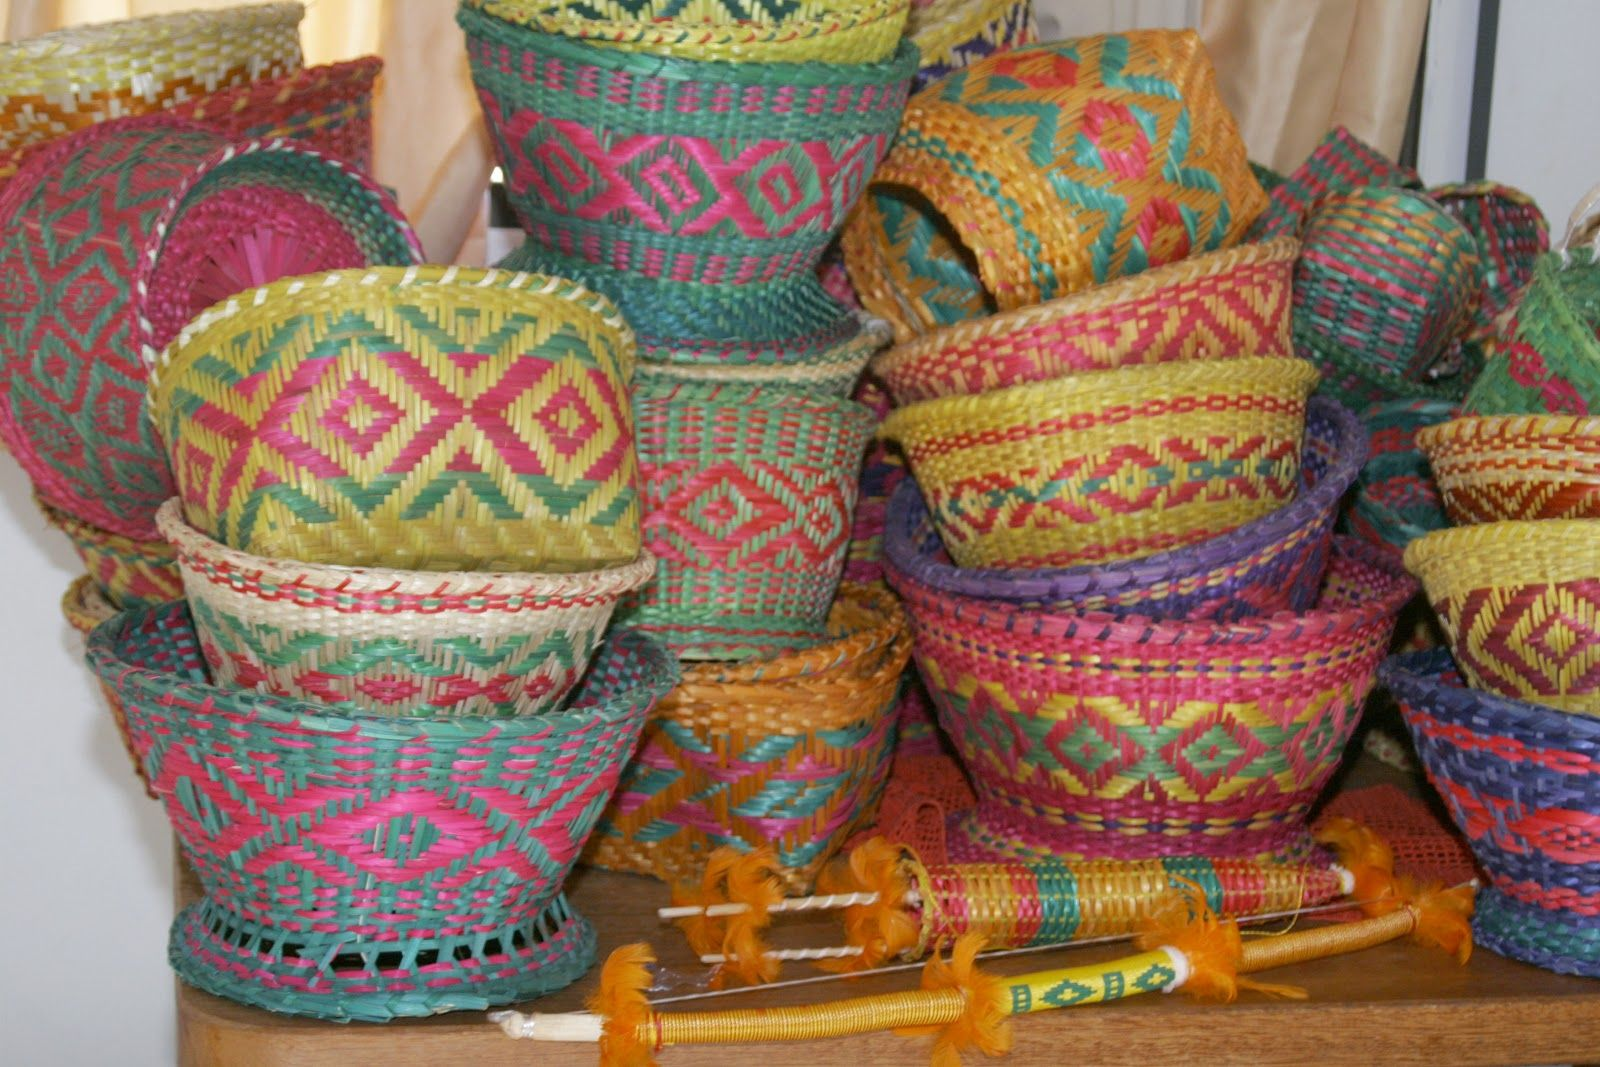 Armario De Parede Cozinha ~ artesanato indígena Brasil Pinterest Indígena, Artesanato brasileiro e Brasil